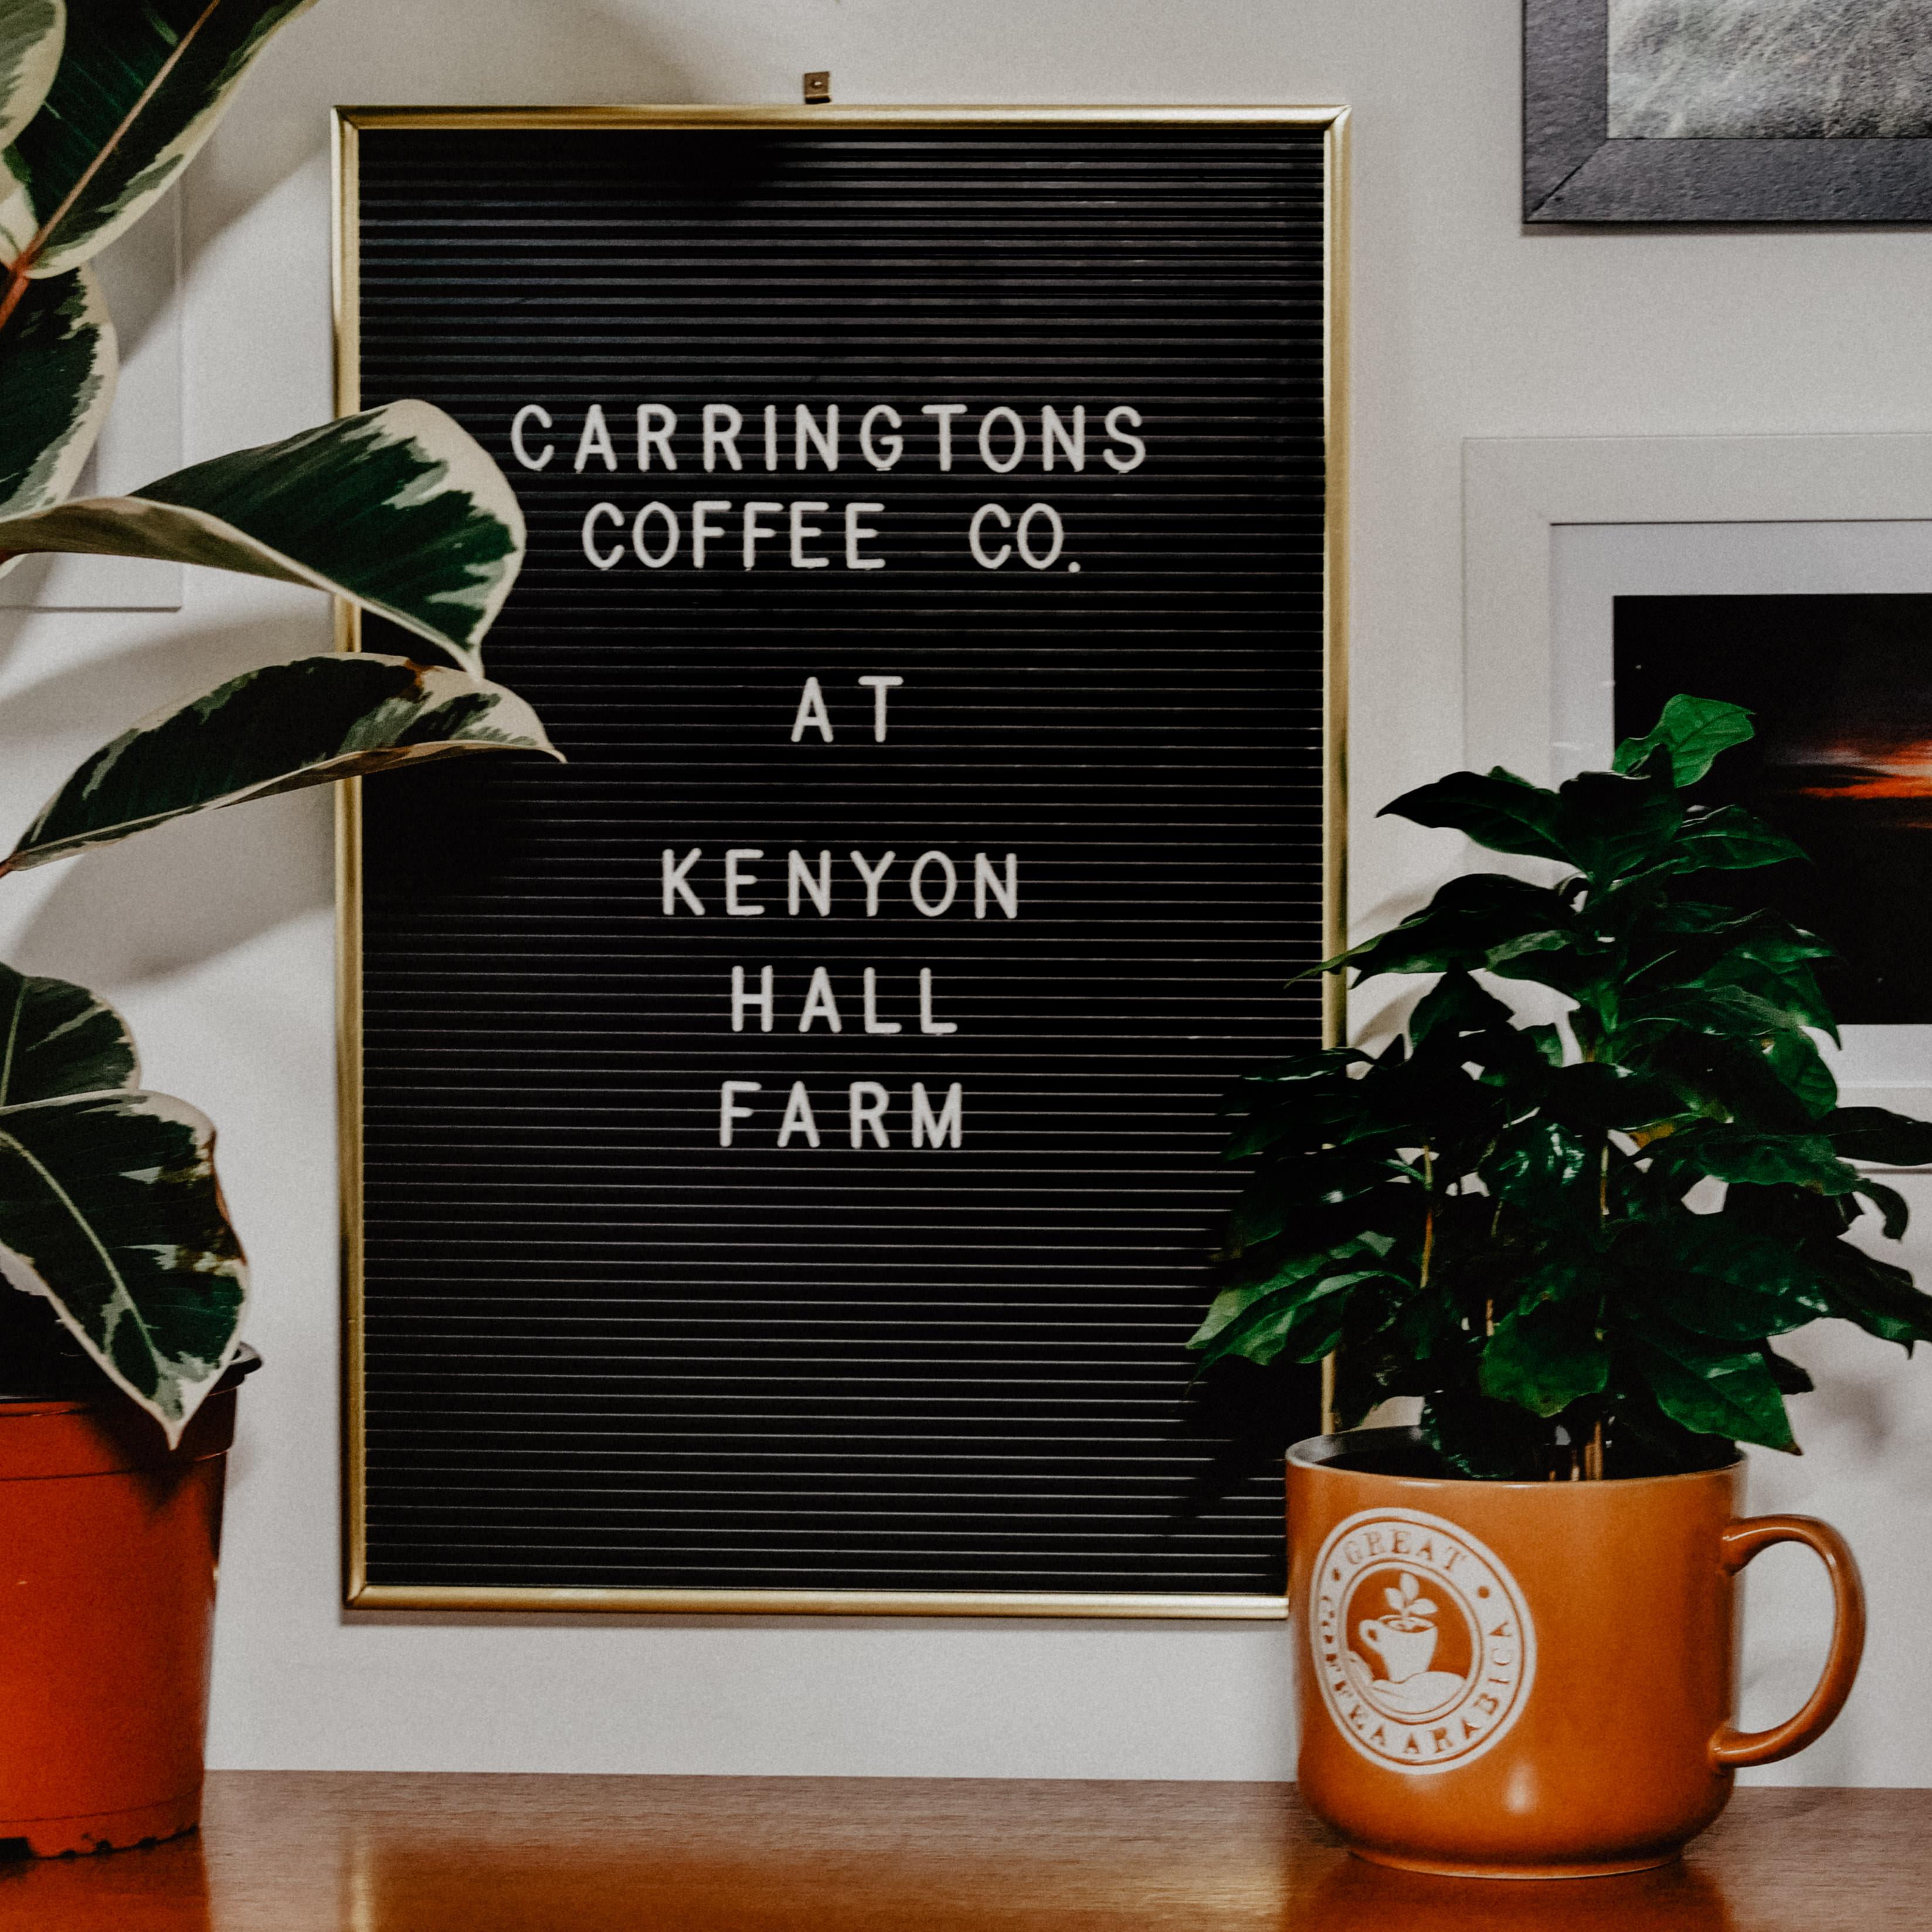 Carringtons Coffee Co